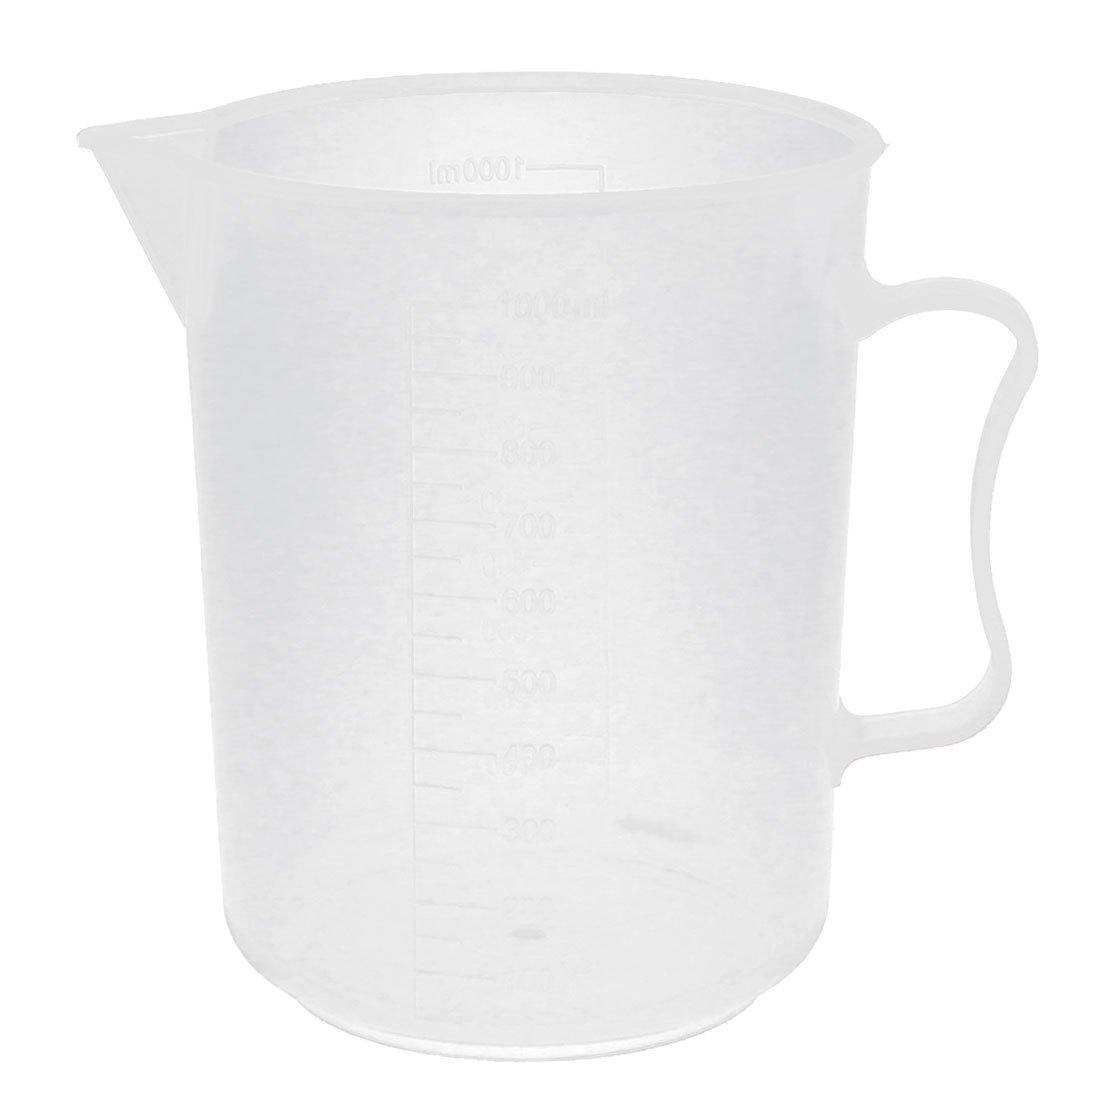 sourcingmap® Plastic Laboratory Measuring Handle Design Beaker 1000ml Transparent a15110200ux0224